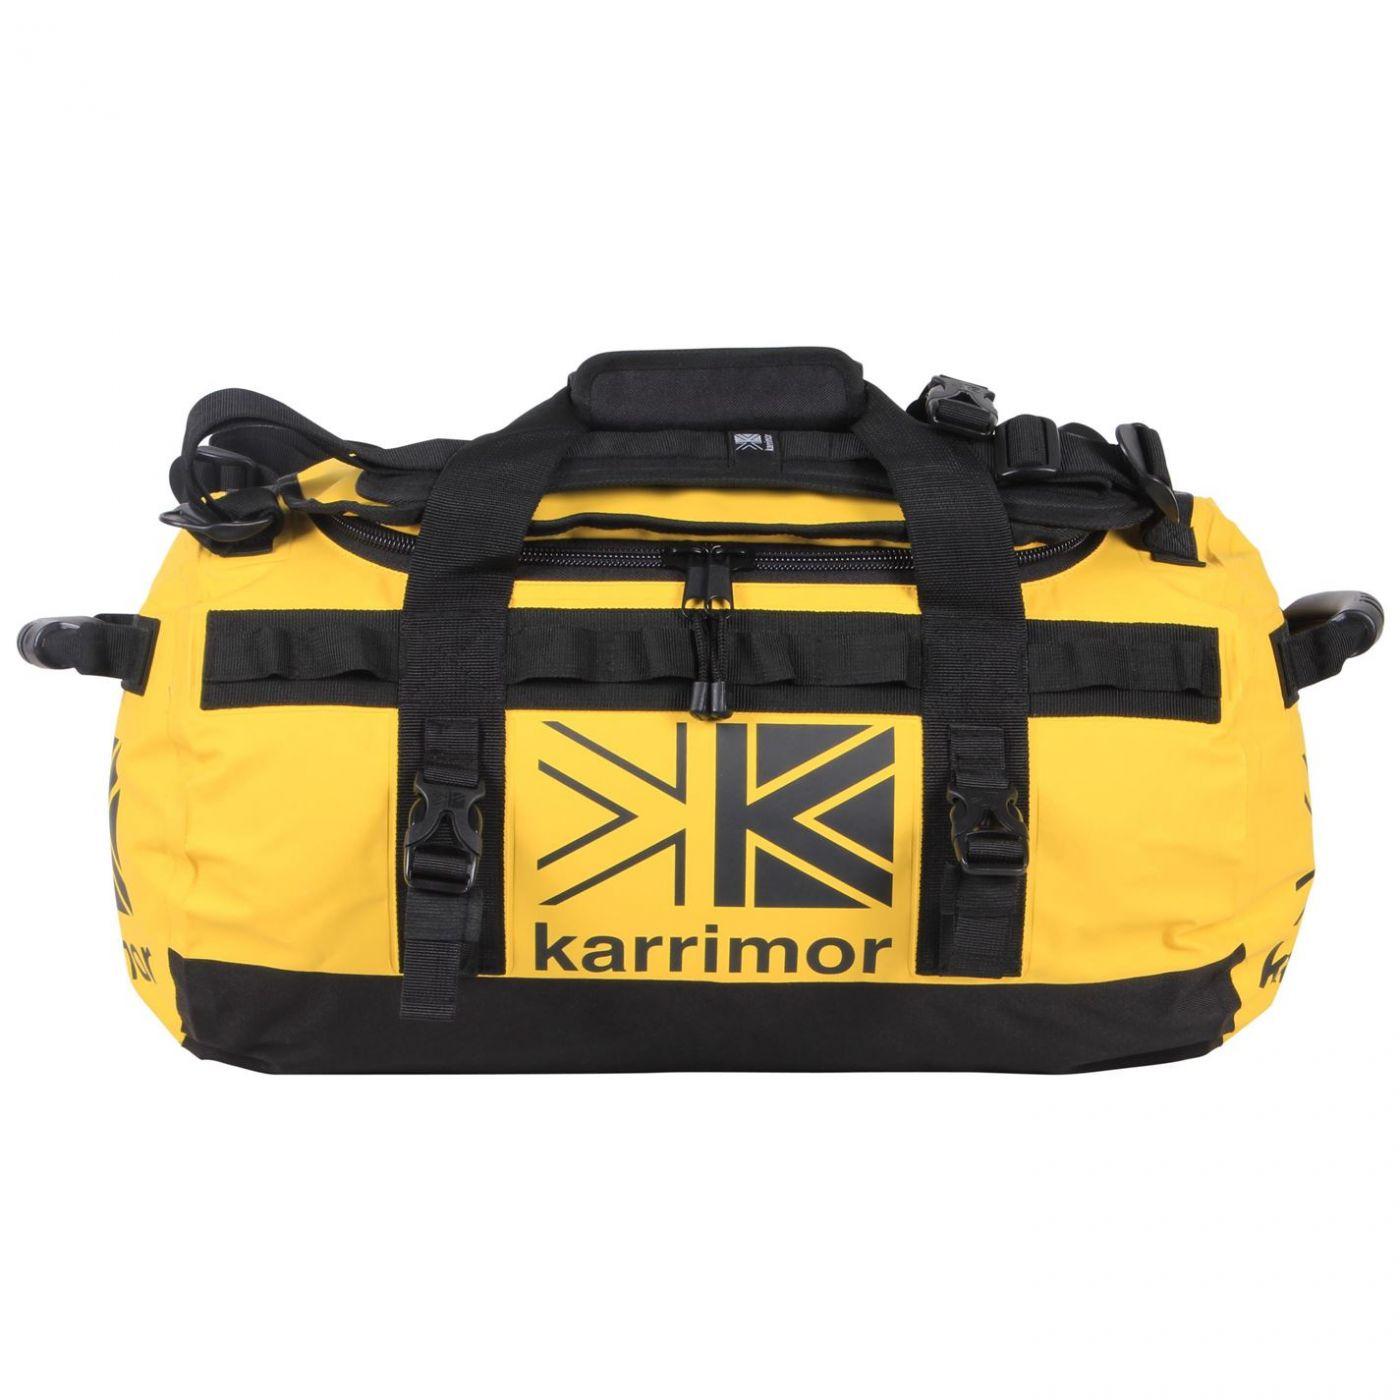 Karrimor 40L Duffle Bag